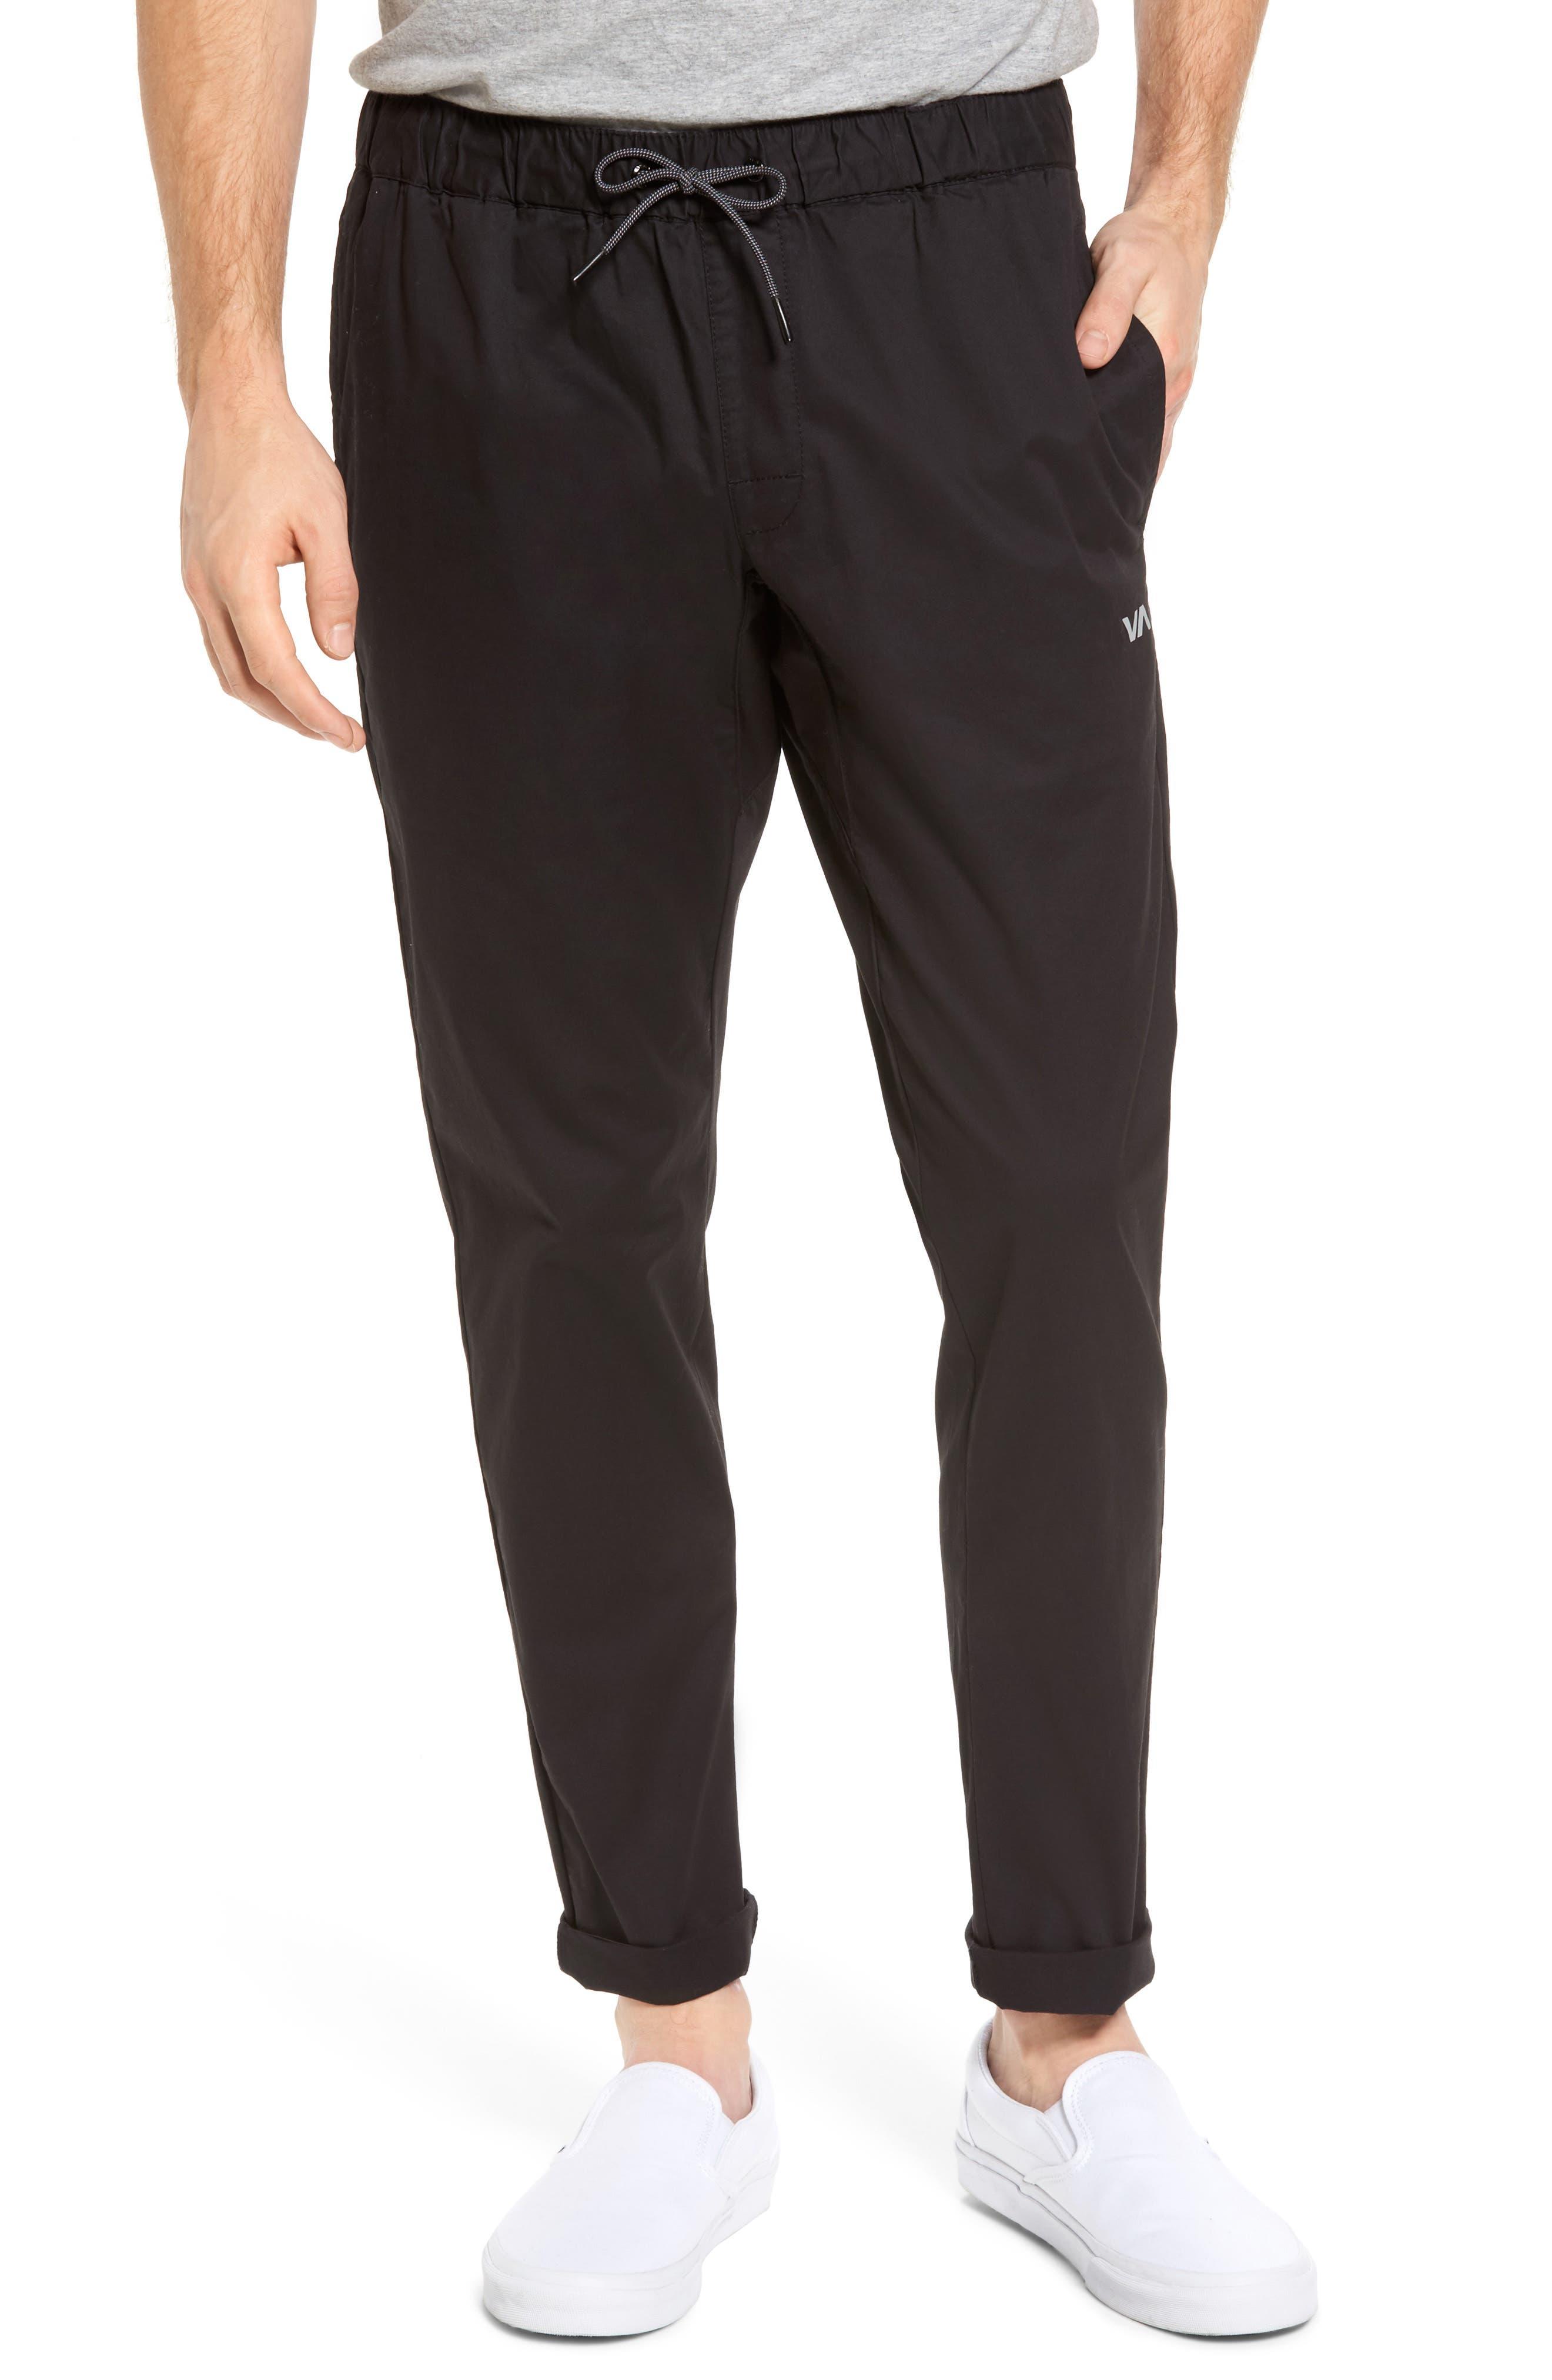 Main Image - RVCA Spectrum Sport Pants